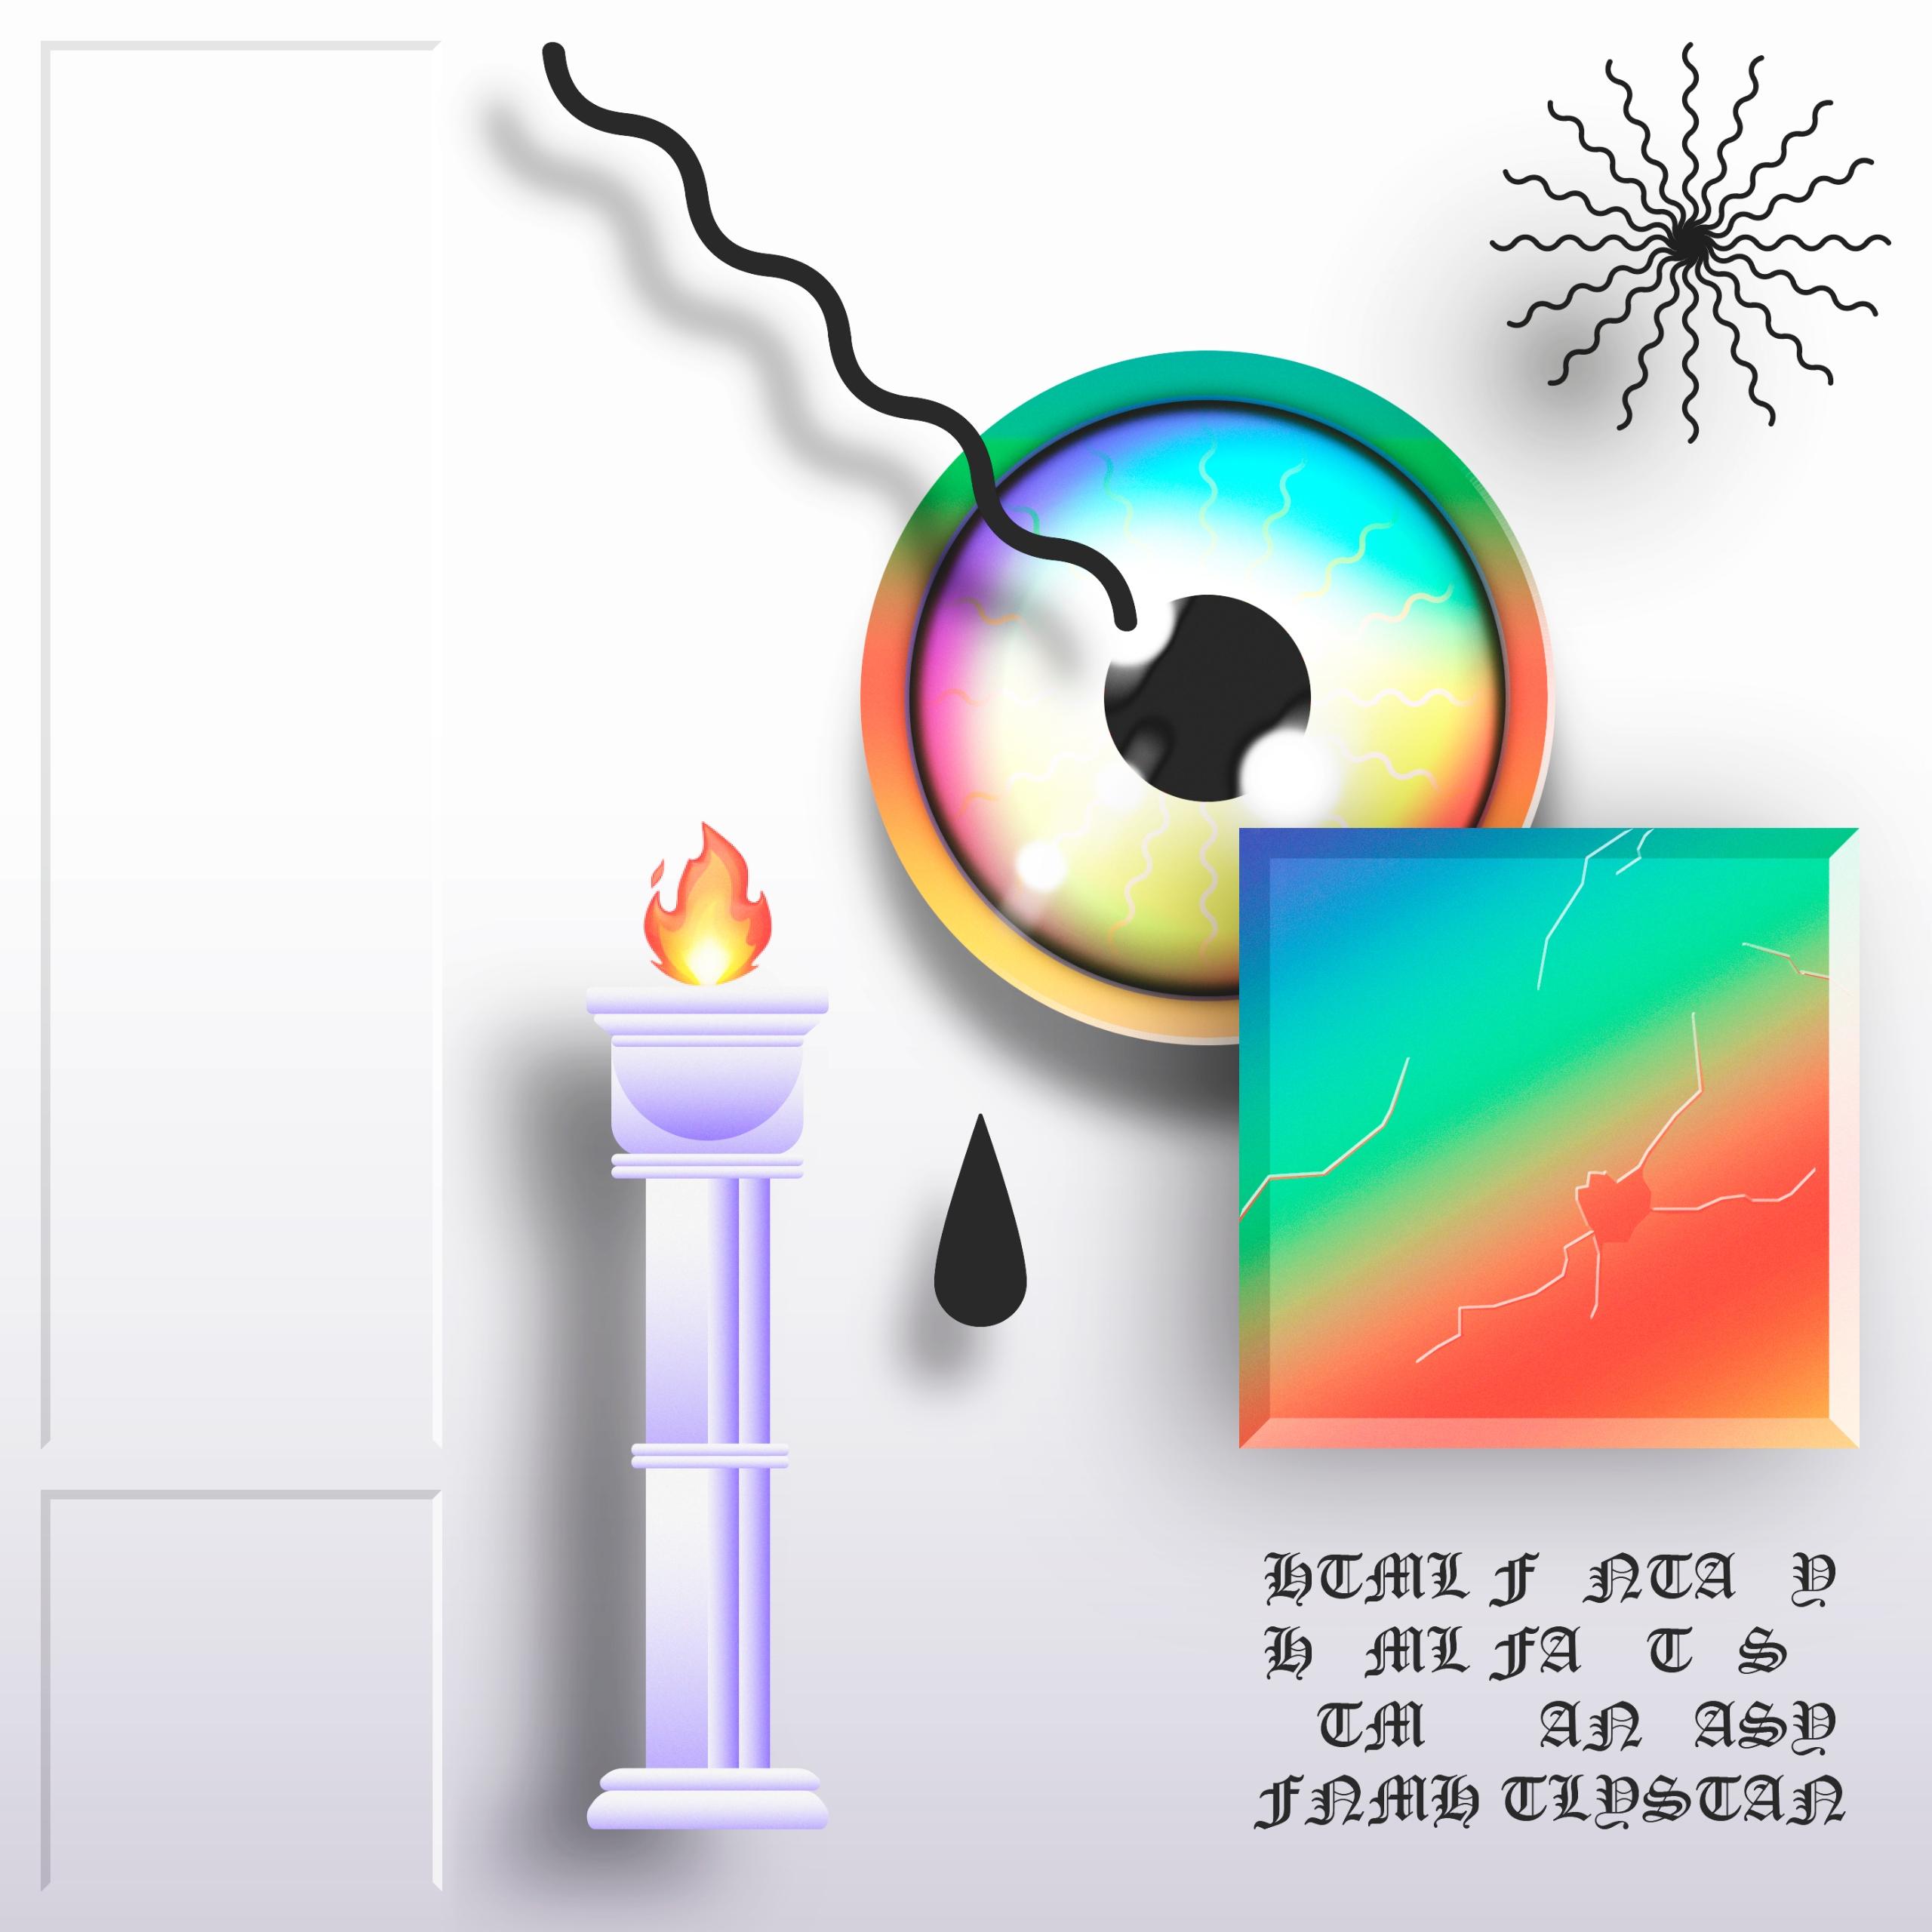 HTML FANTASY 𝕳𝕿𝕸𝕷 𝕱𝕬𝕹𝕿𝕬𝕾𝖄 - vaporwave - lxtxcx | ello